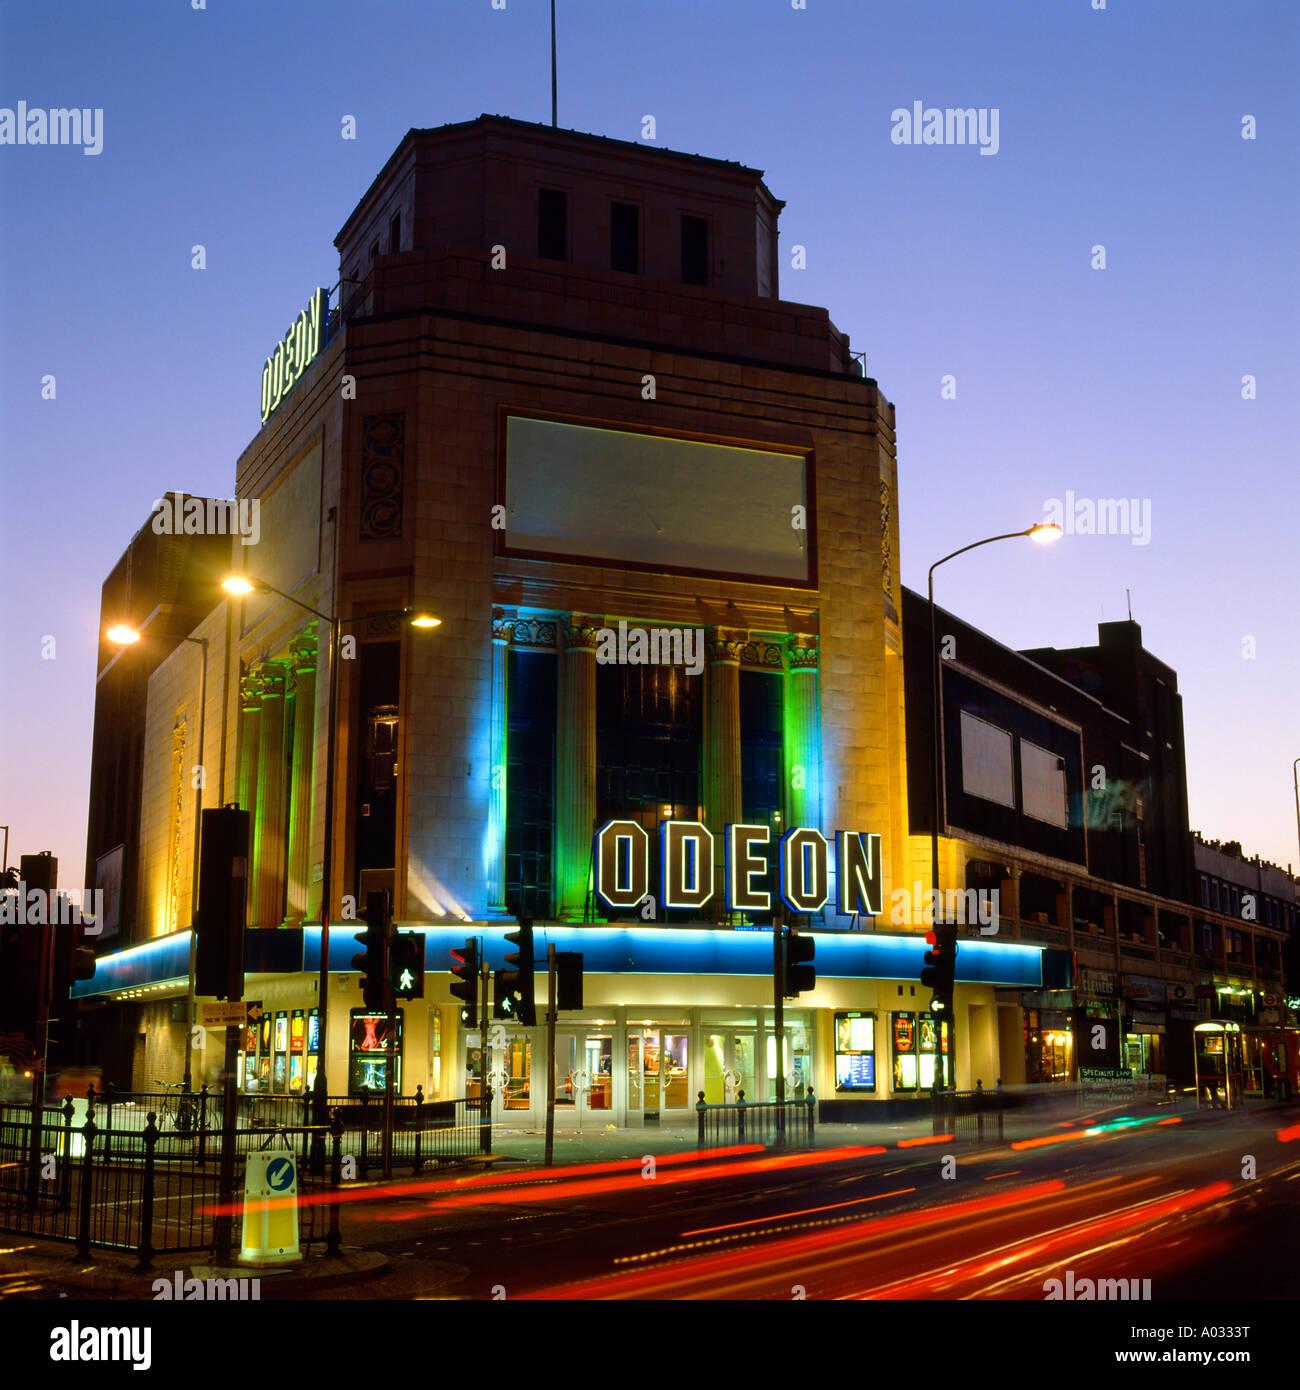 The Odeon Cinema Illuminated at Night, Holloway Road, London. - Stock Image